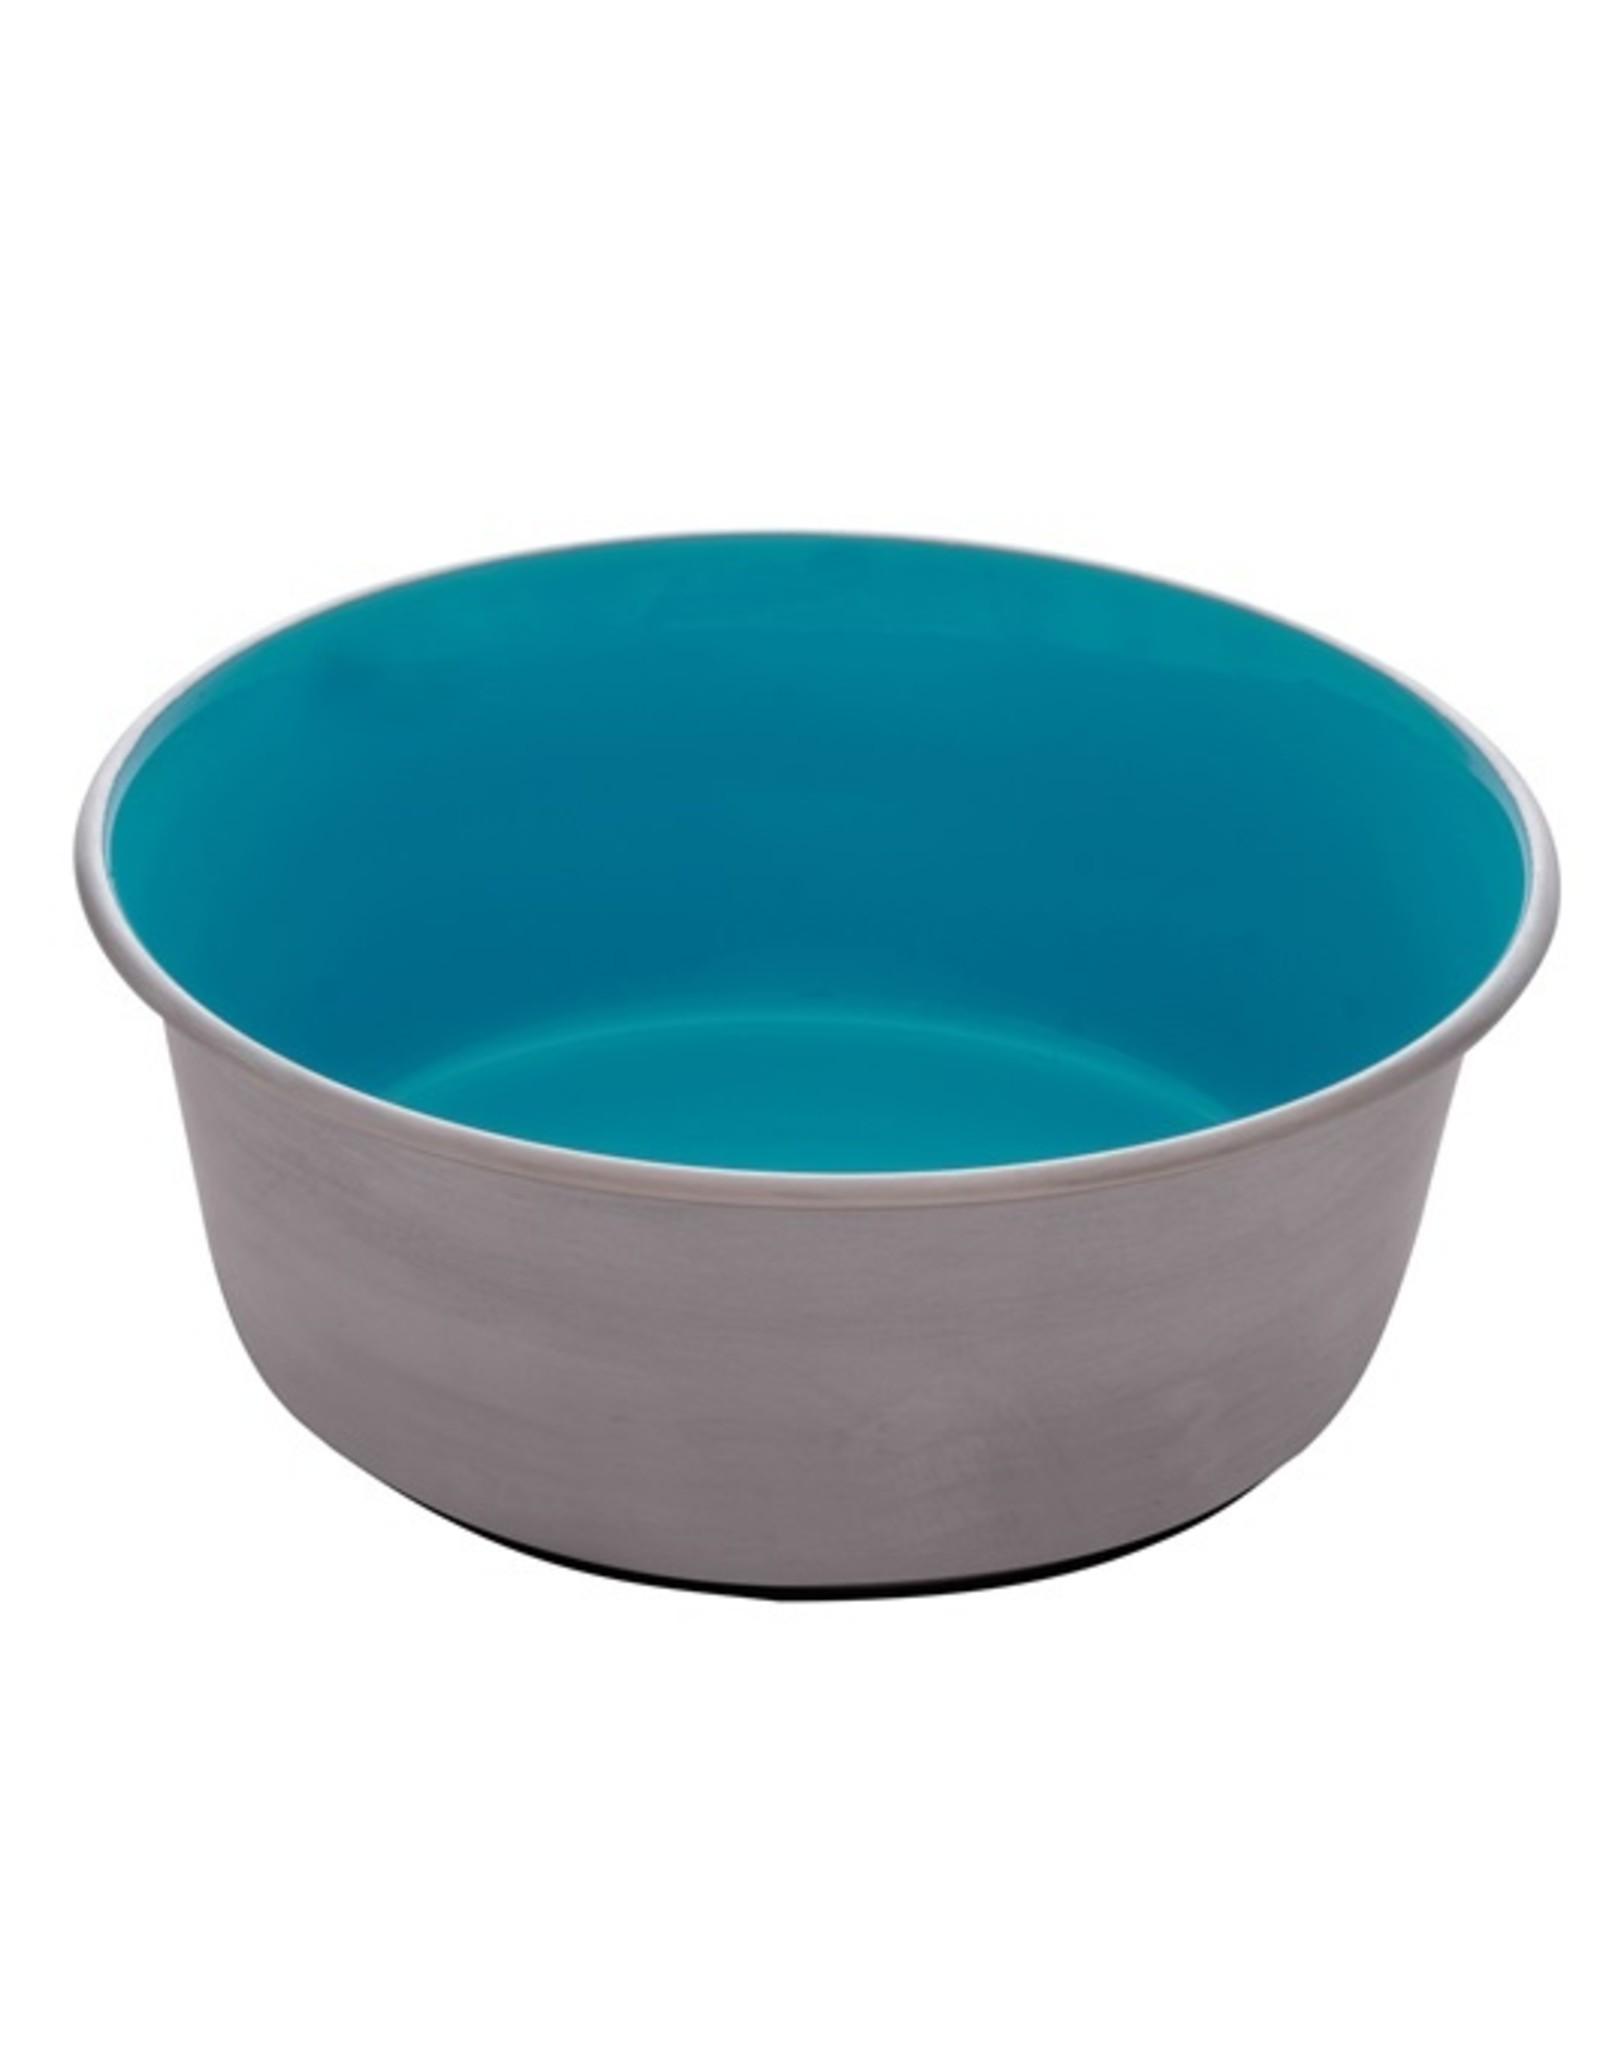 DogIt Stainless Steel Non-Skid Bowl Blue 1150ml